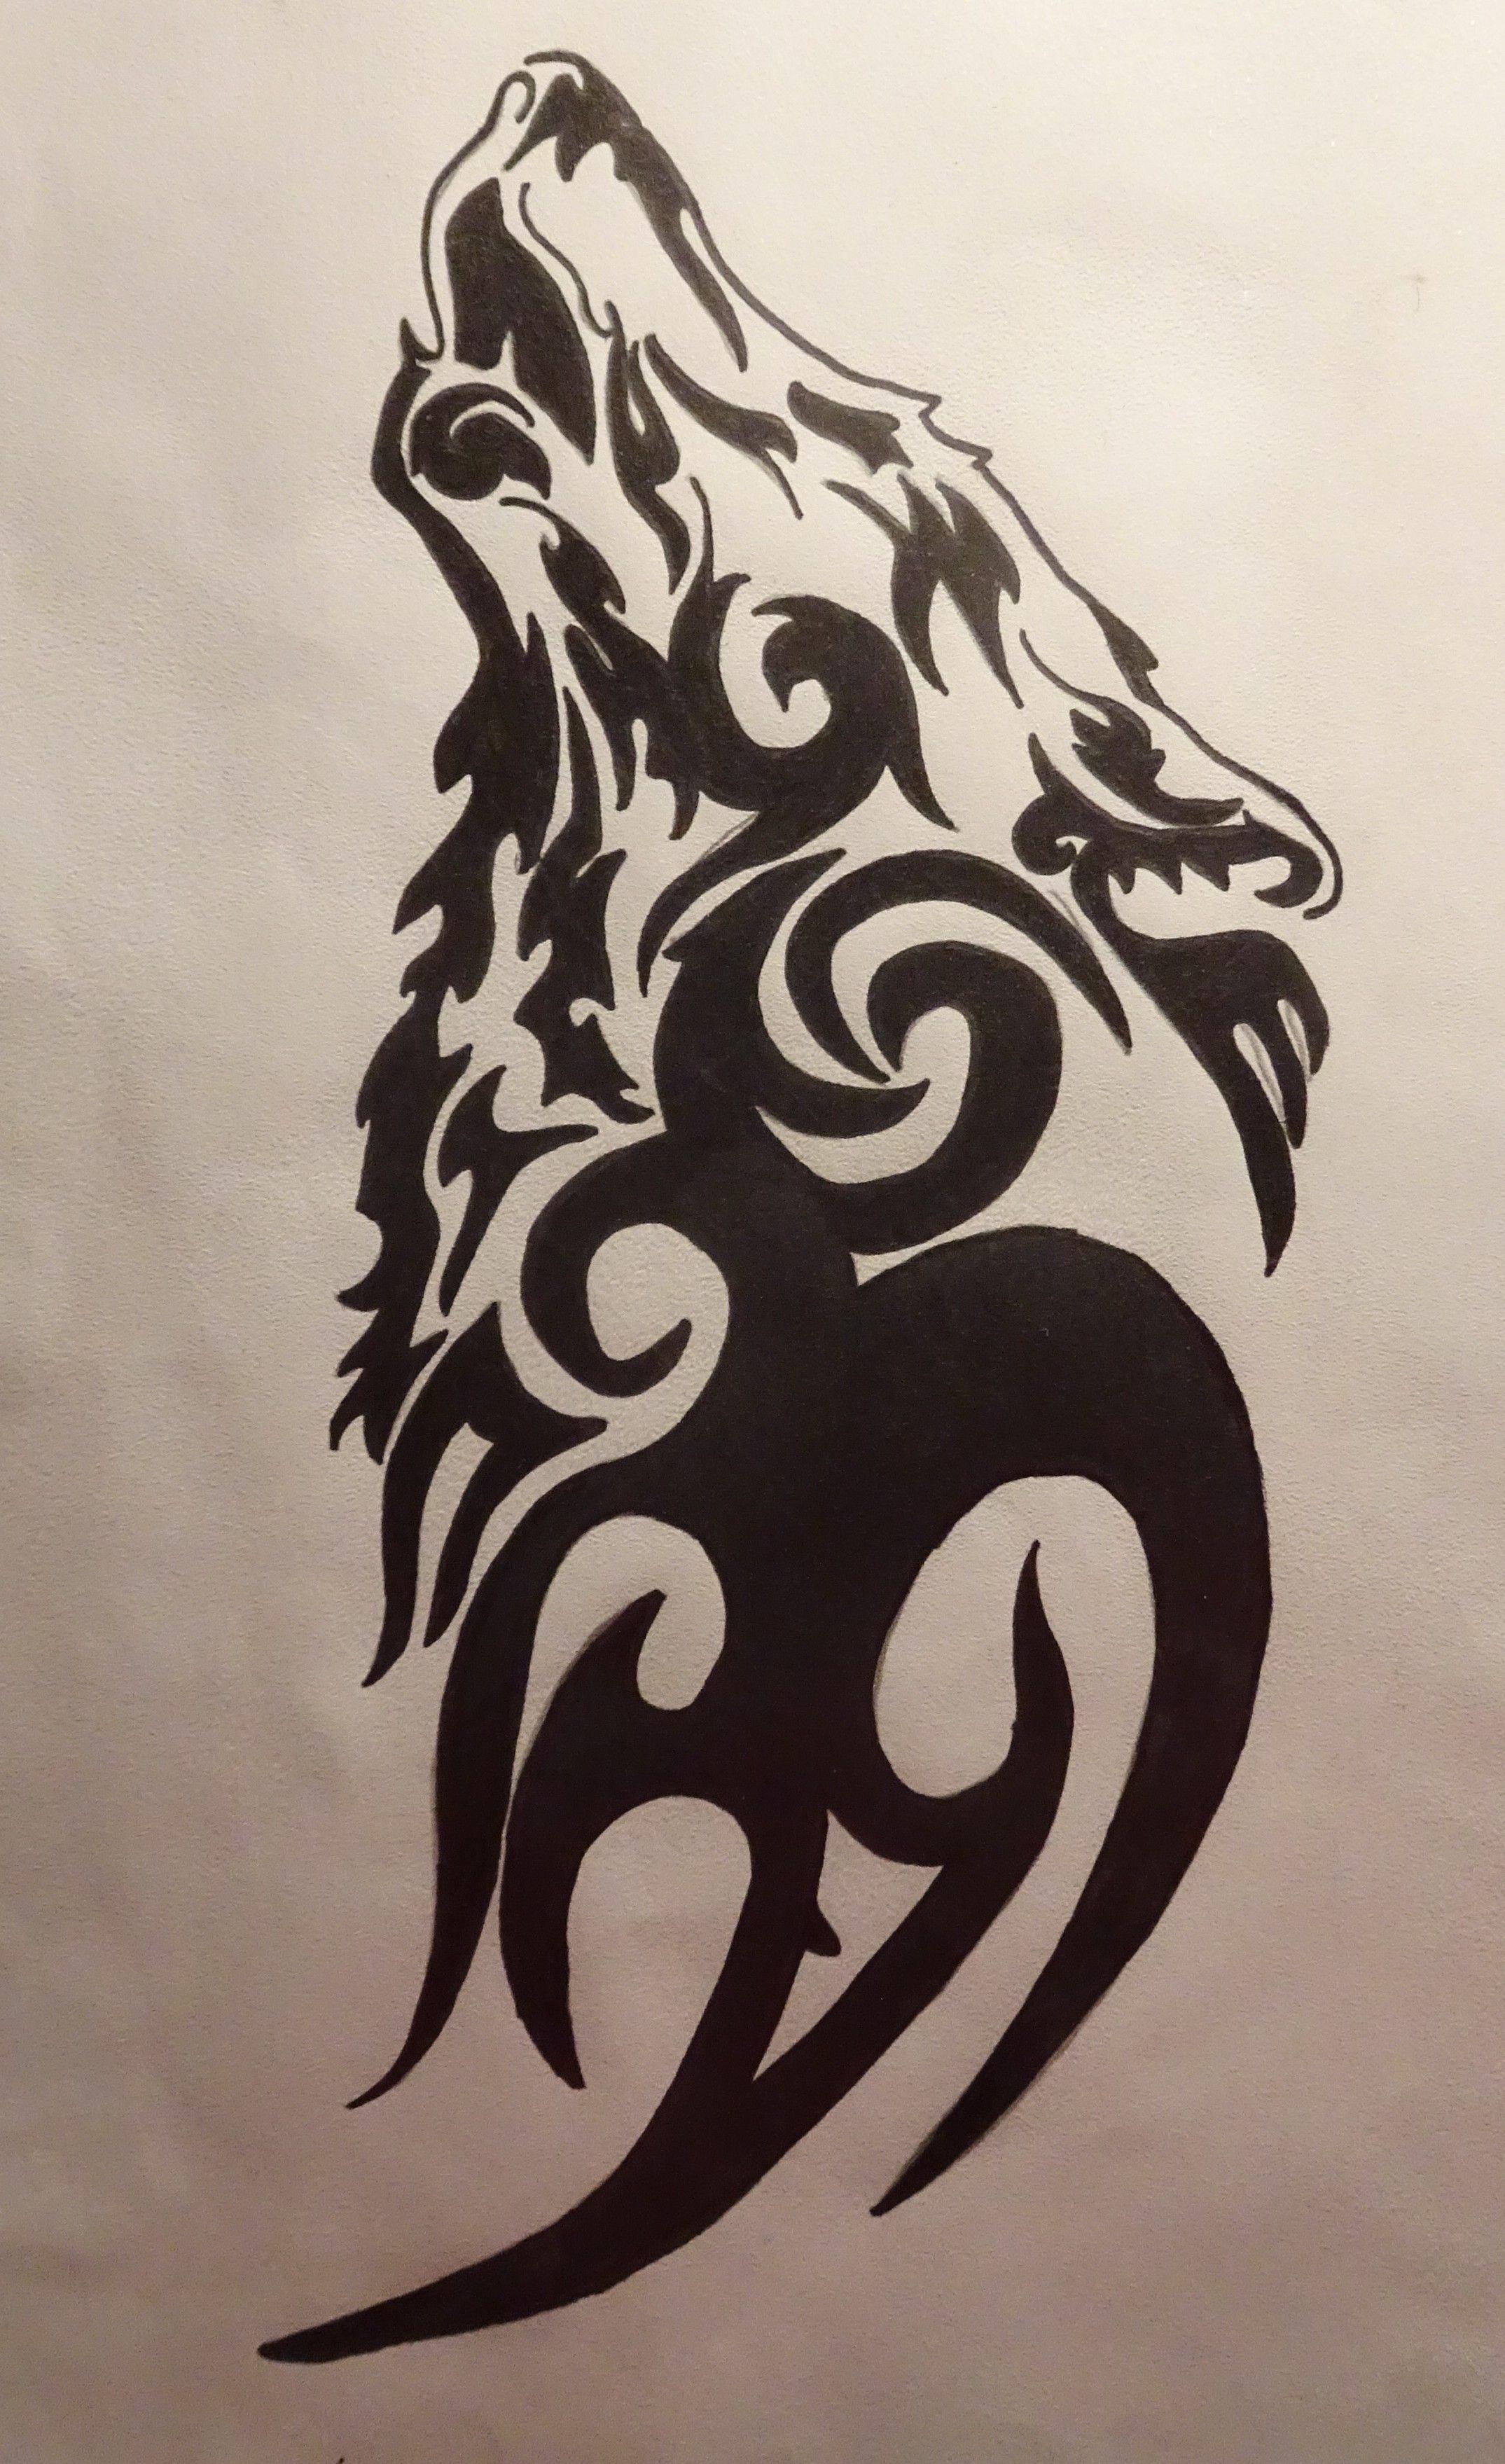 Pin By Roberto Porras Jr On Dessin Tribal Tribal Wolf Tattoo Tribal Animal Tattoos Wolf Tattoos